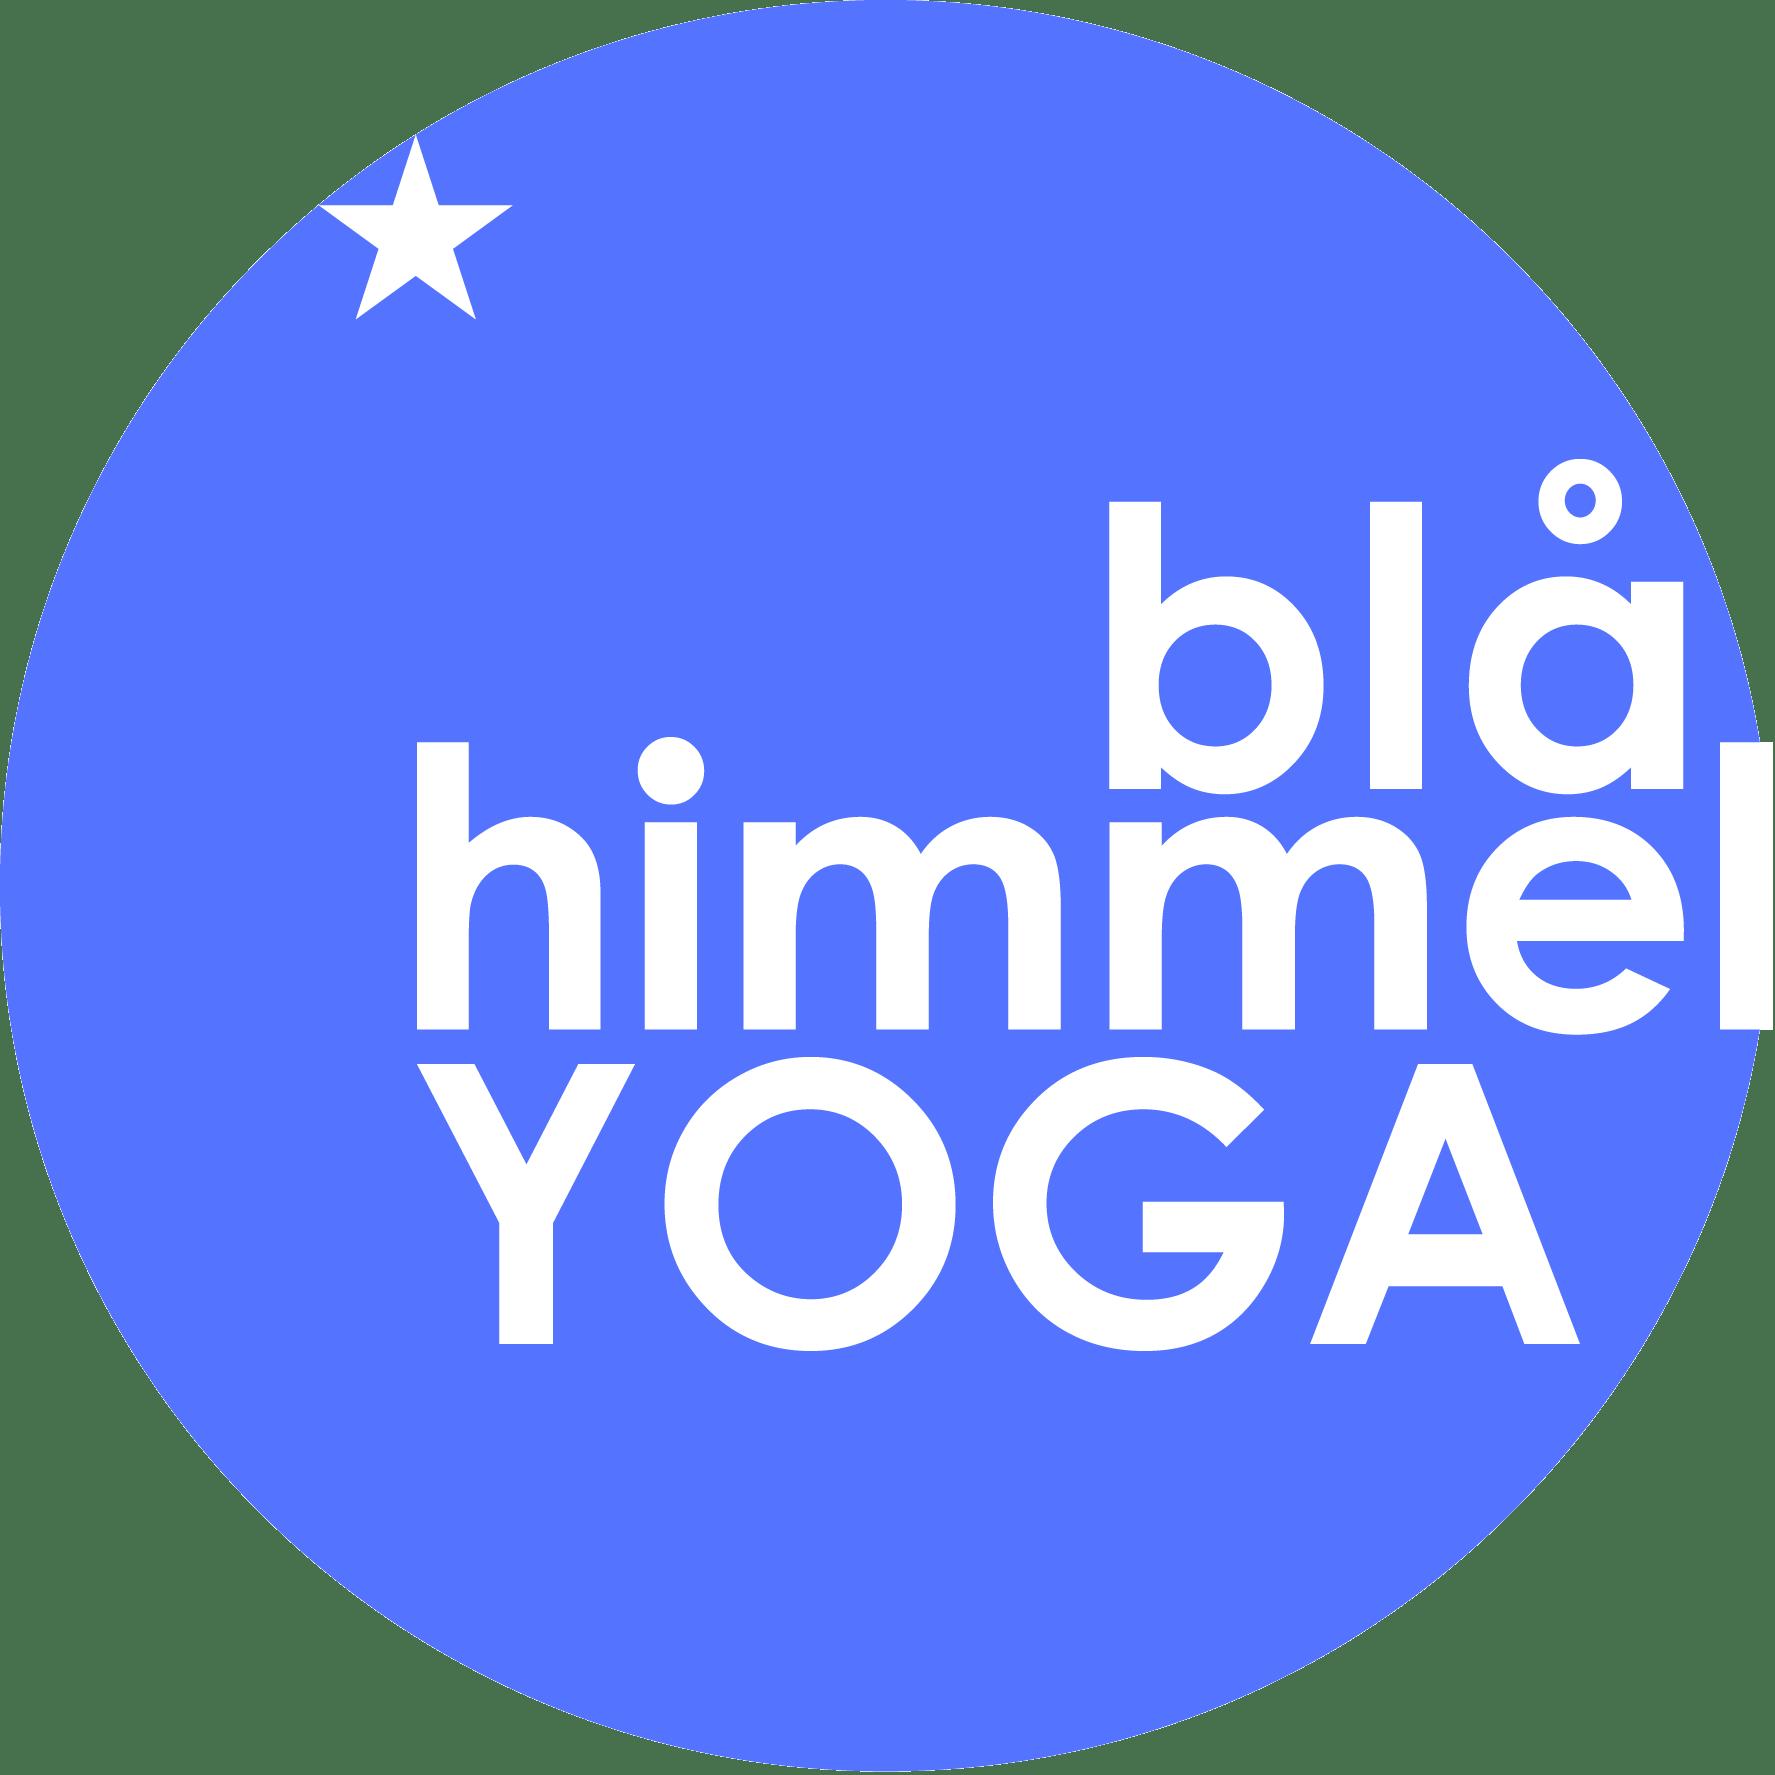 Blå Himmel Yogas logo